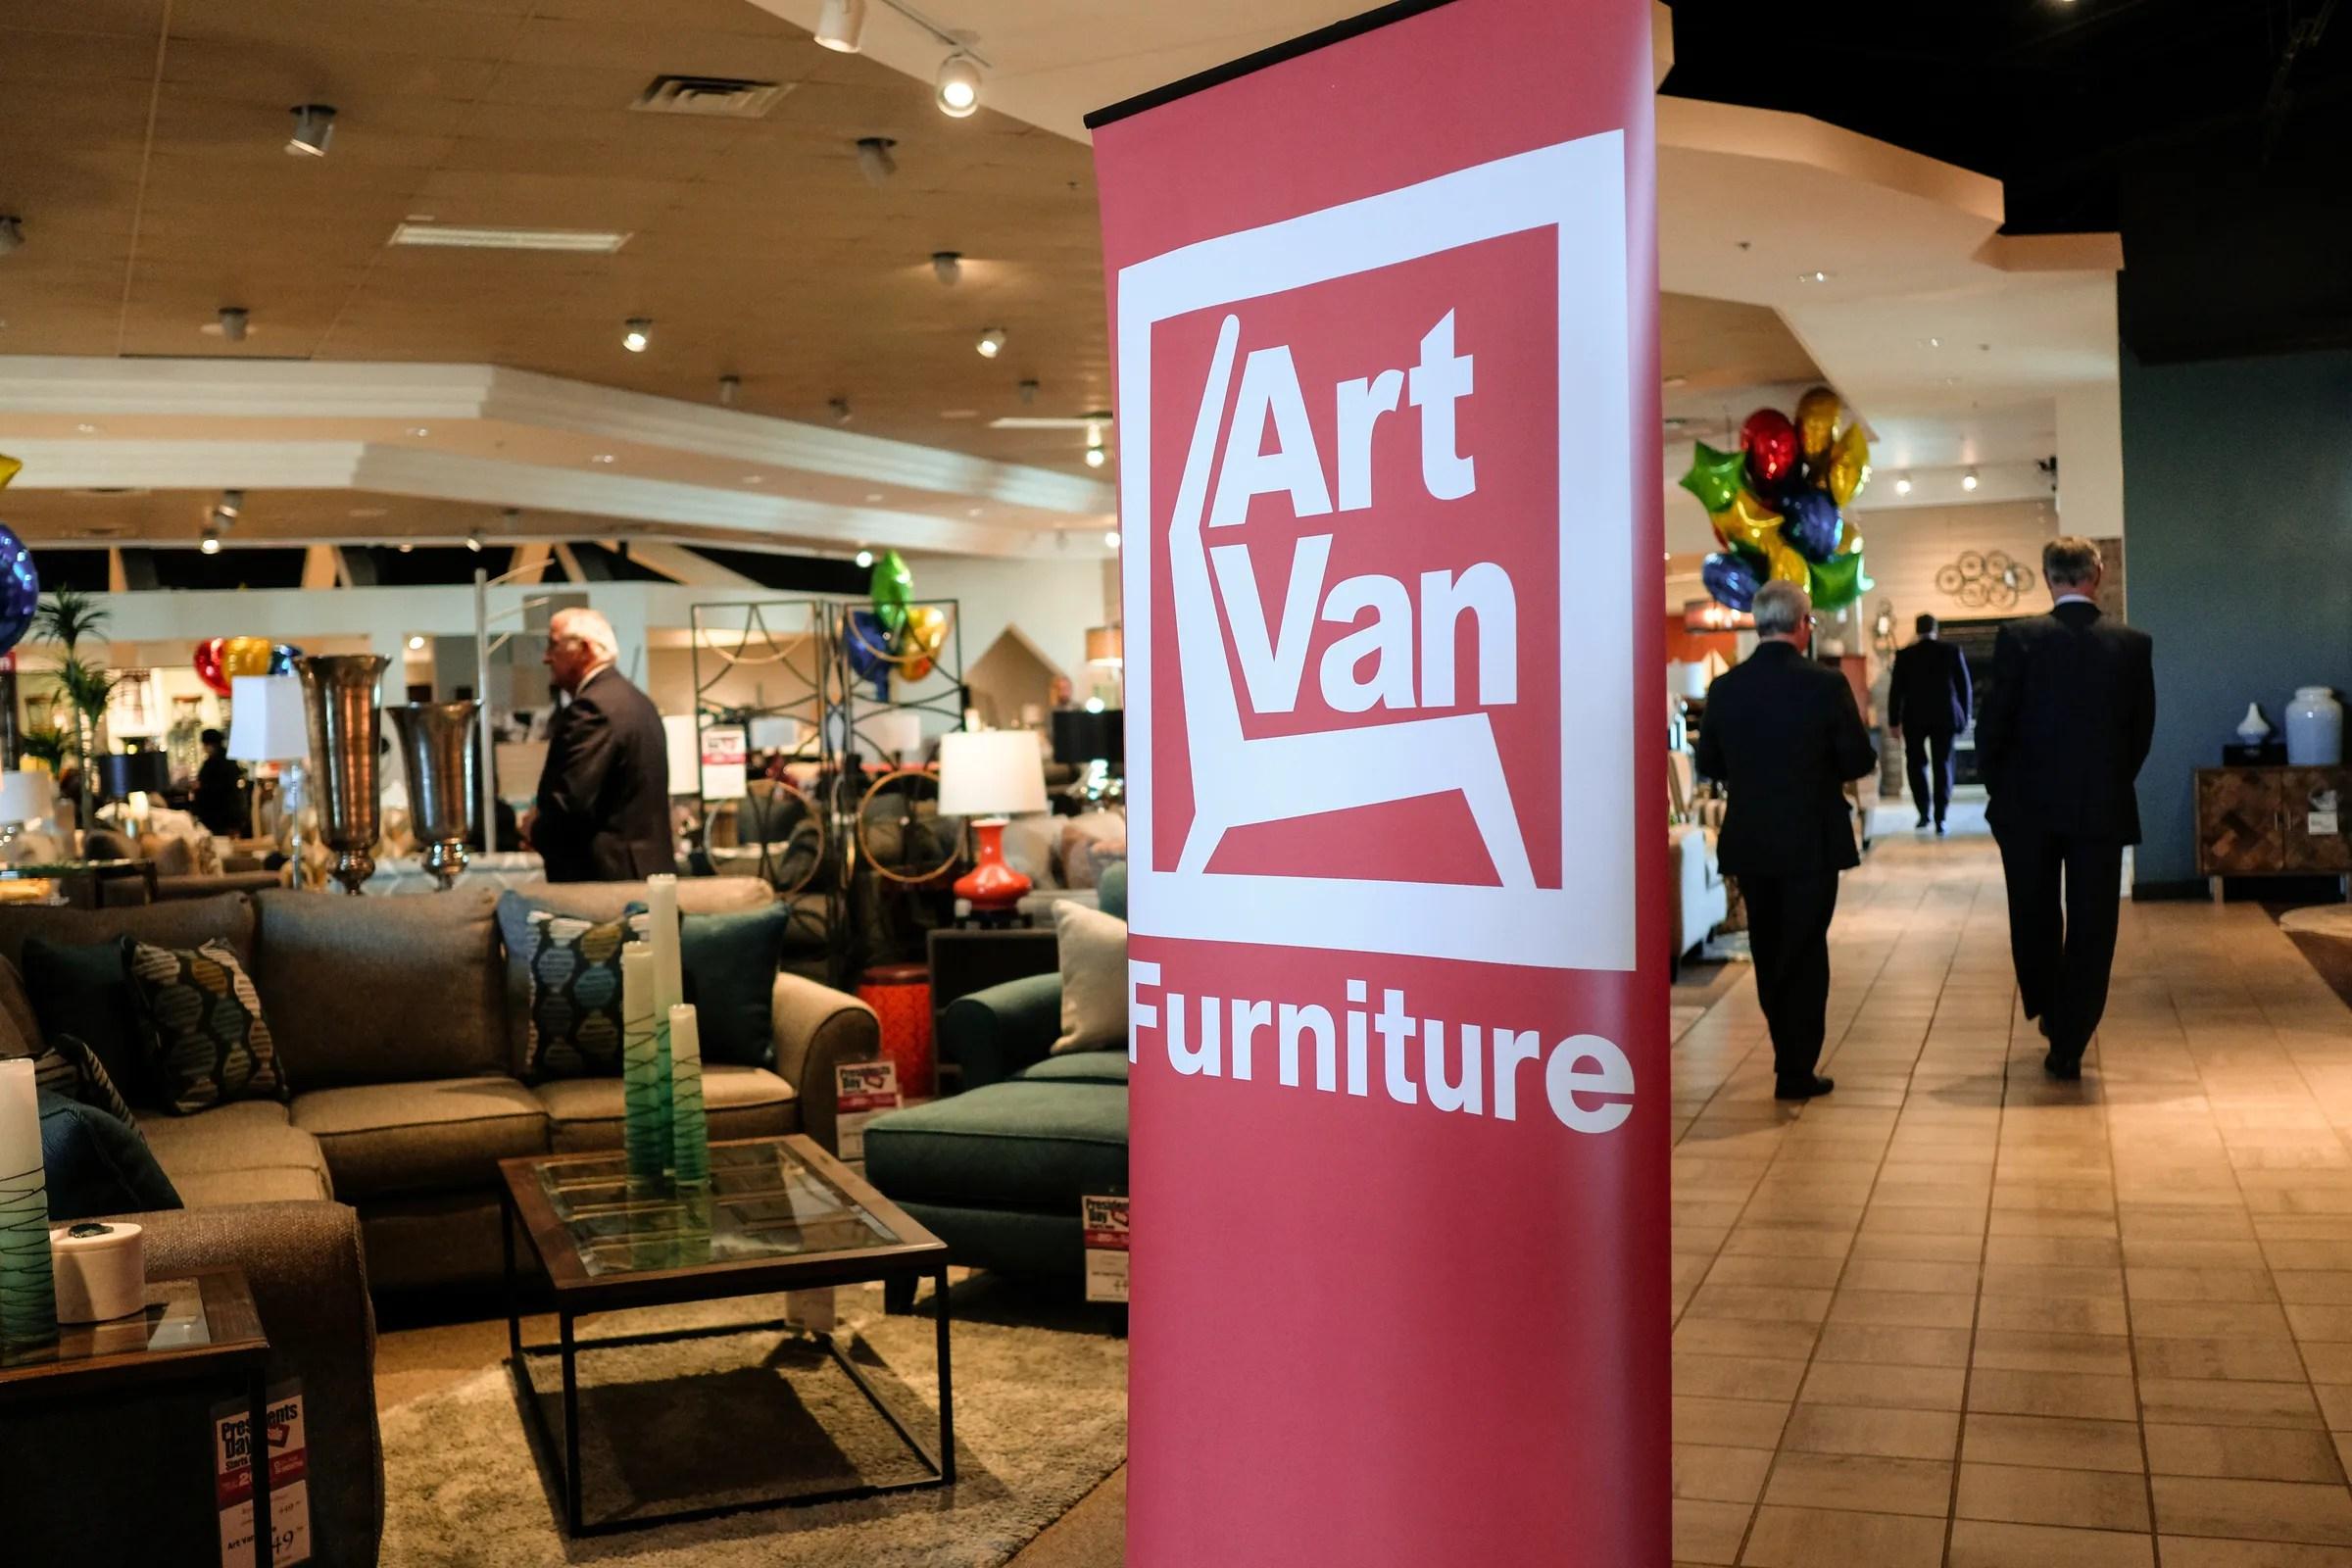 art van furniture to close its stores